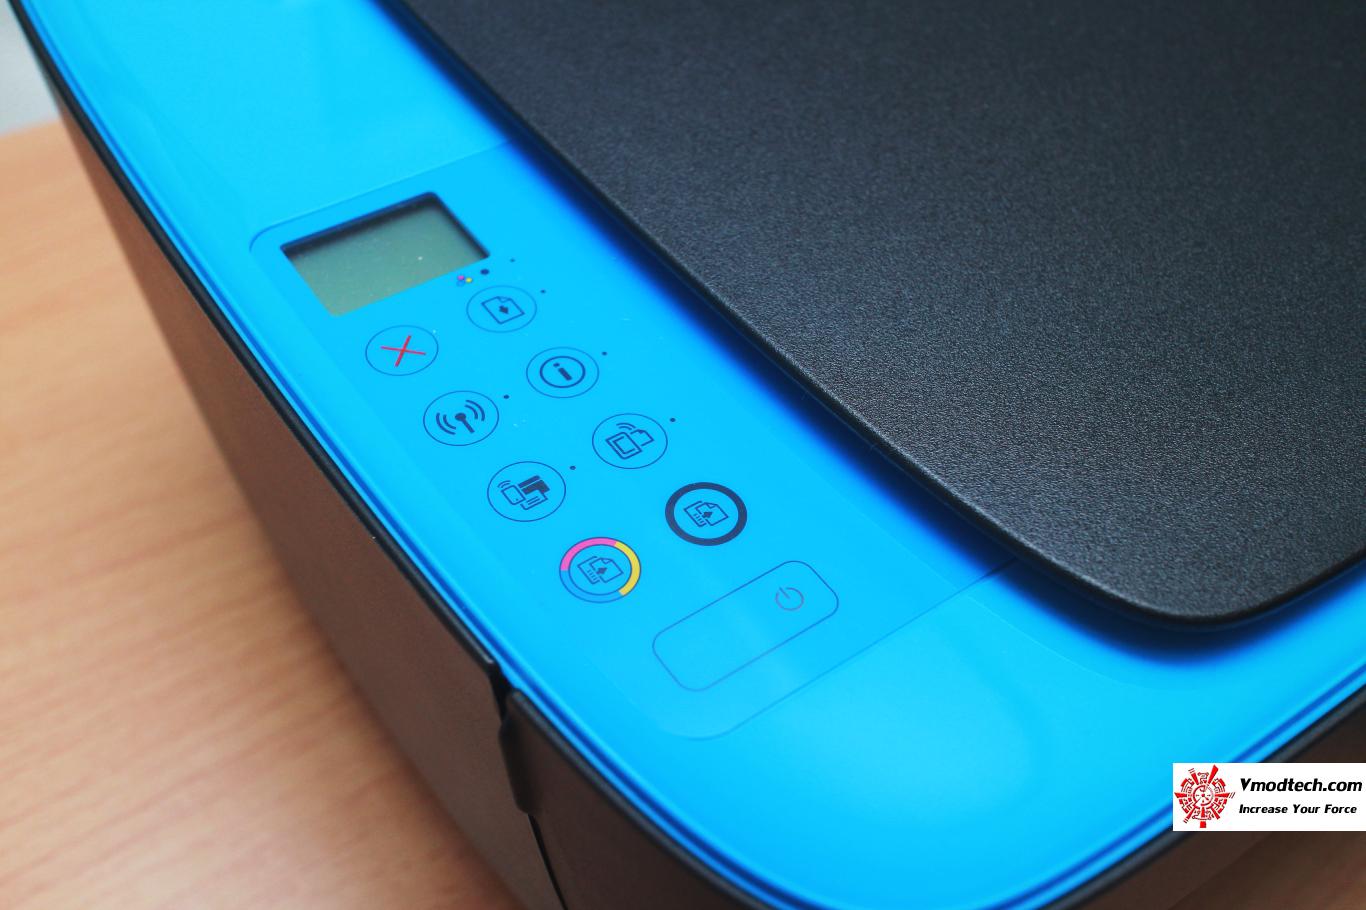 img 6936 HP Deskjet Ink Advantage Ultra 4729 All in One Printer